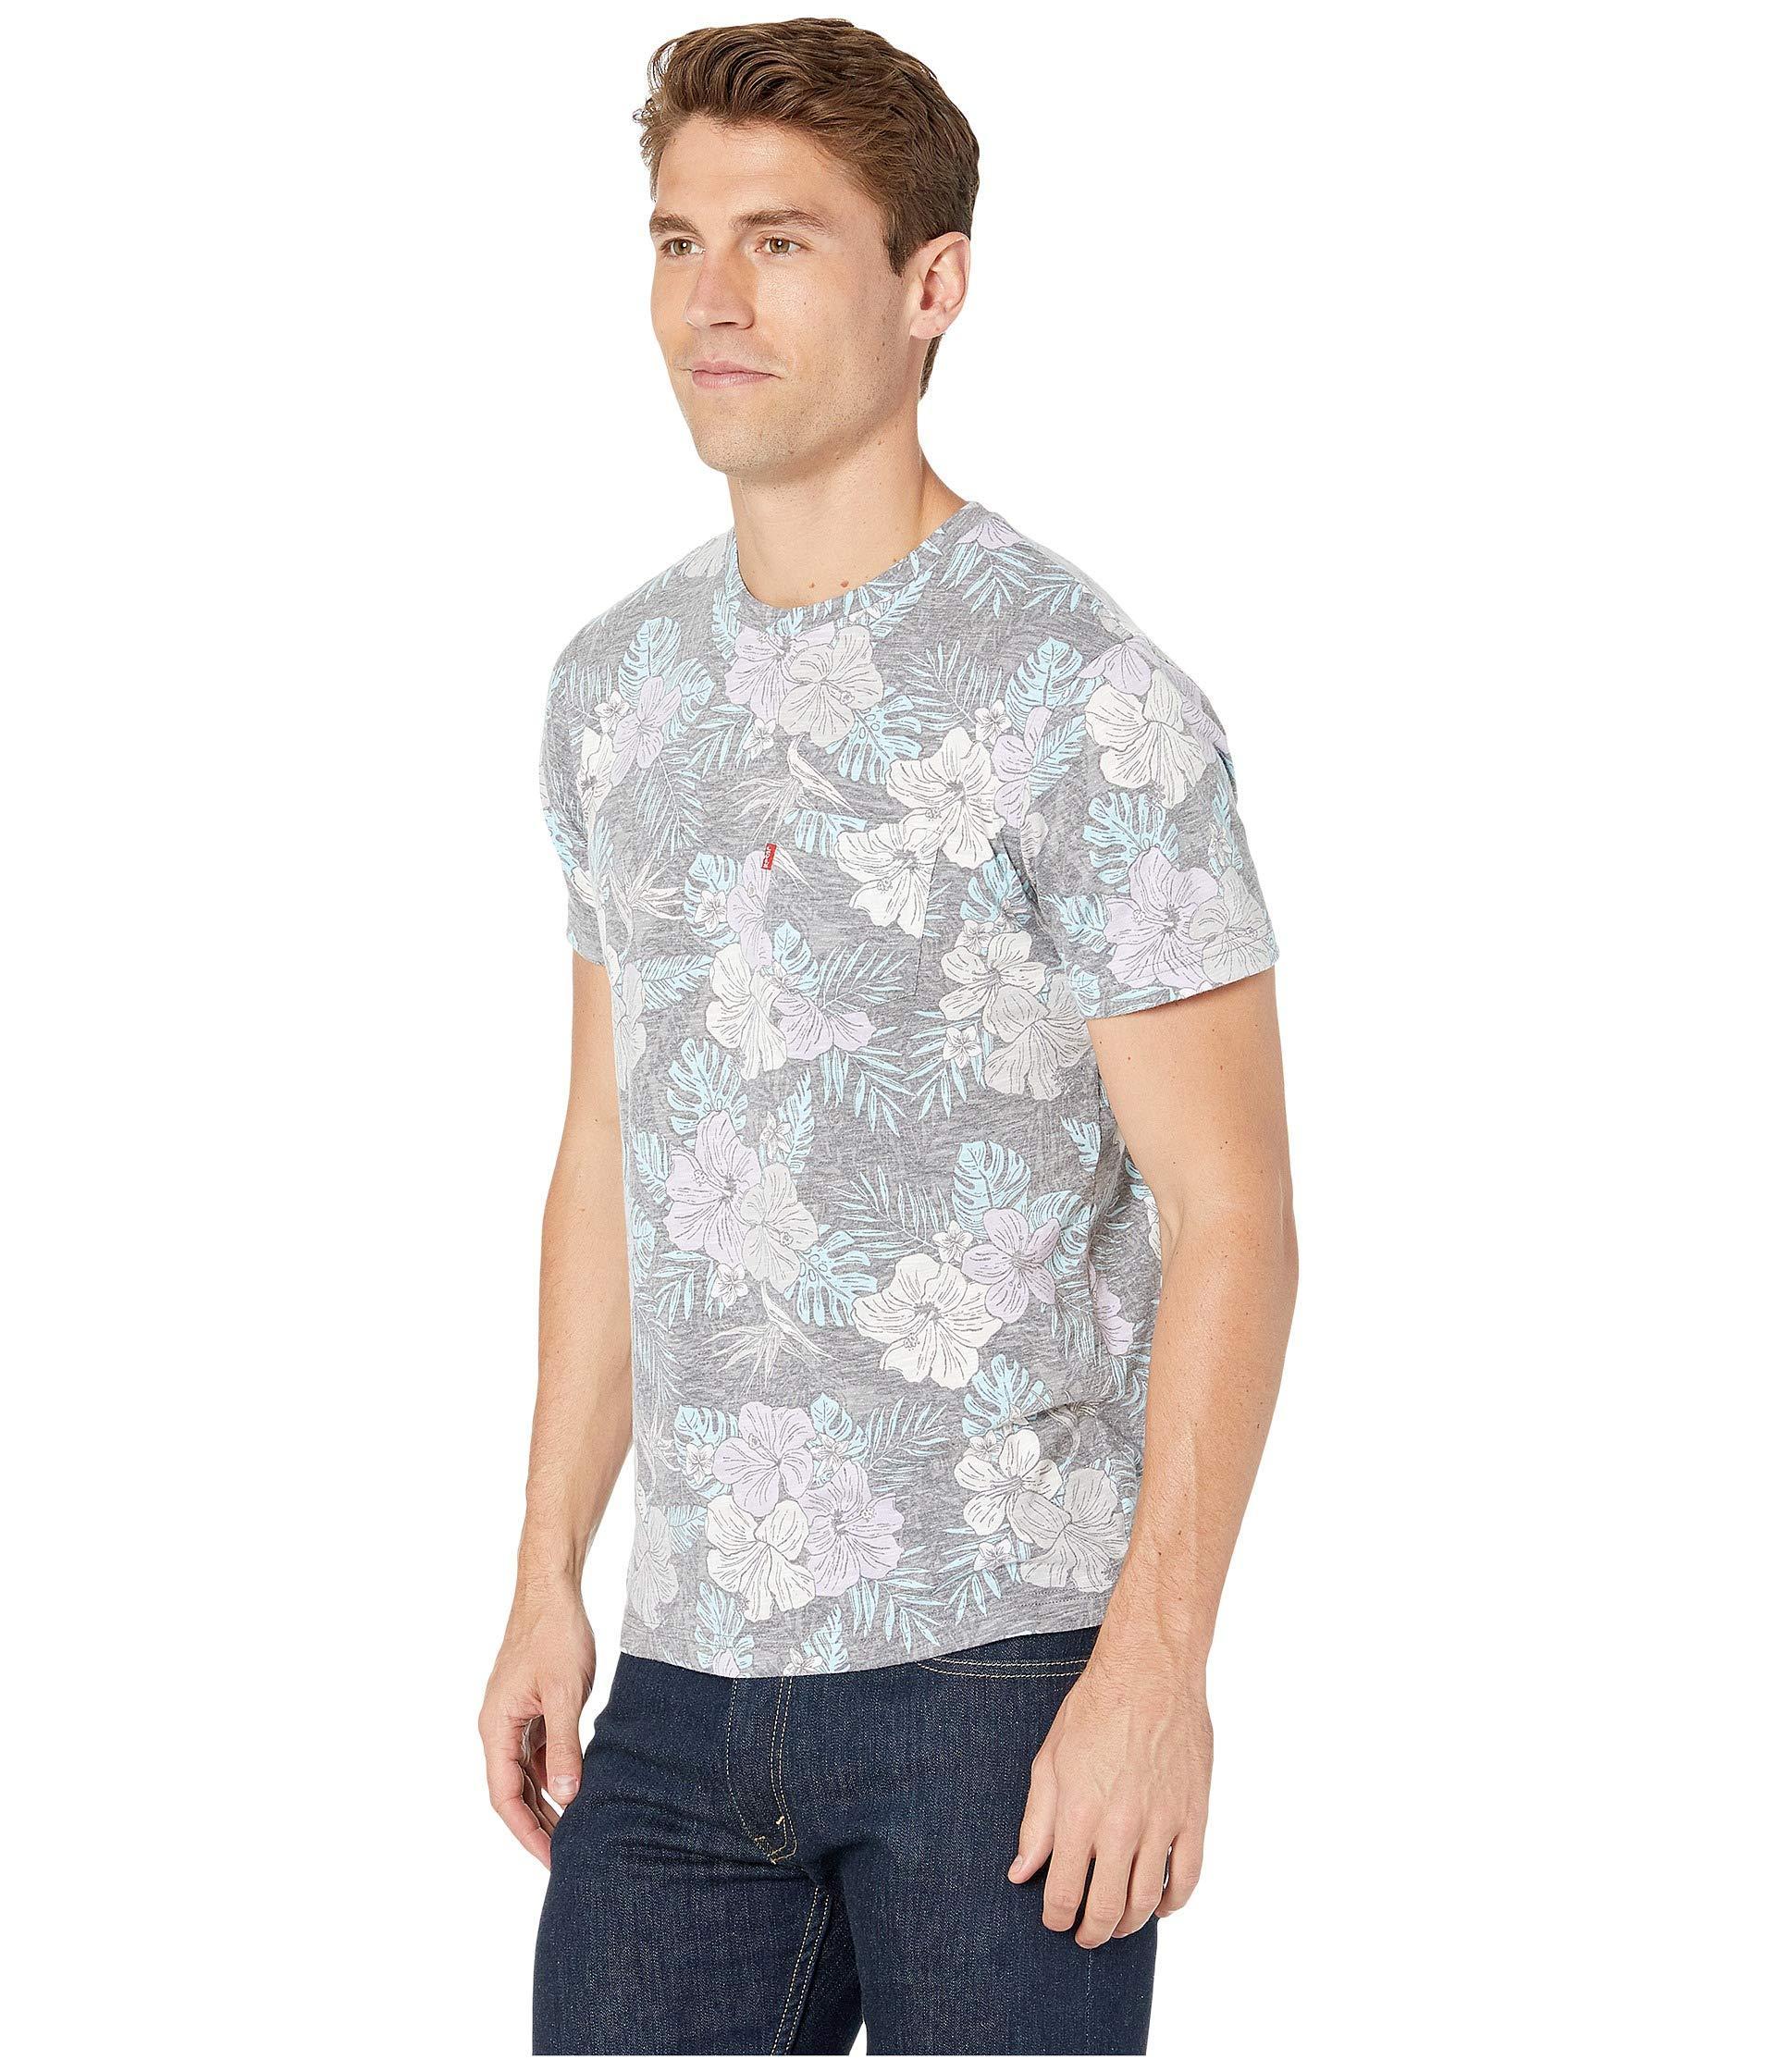 7583c7cc5 Lyst - Levi's Levi's(r) Valley Short Sleeve T-shirt (dress Blues) Men's  Clothing in Gray for Men